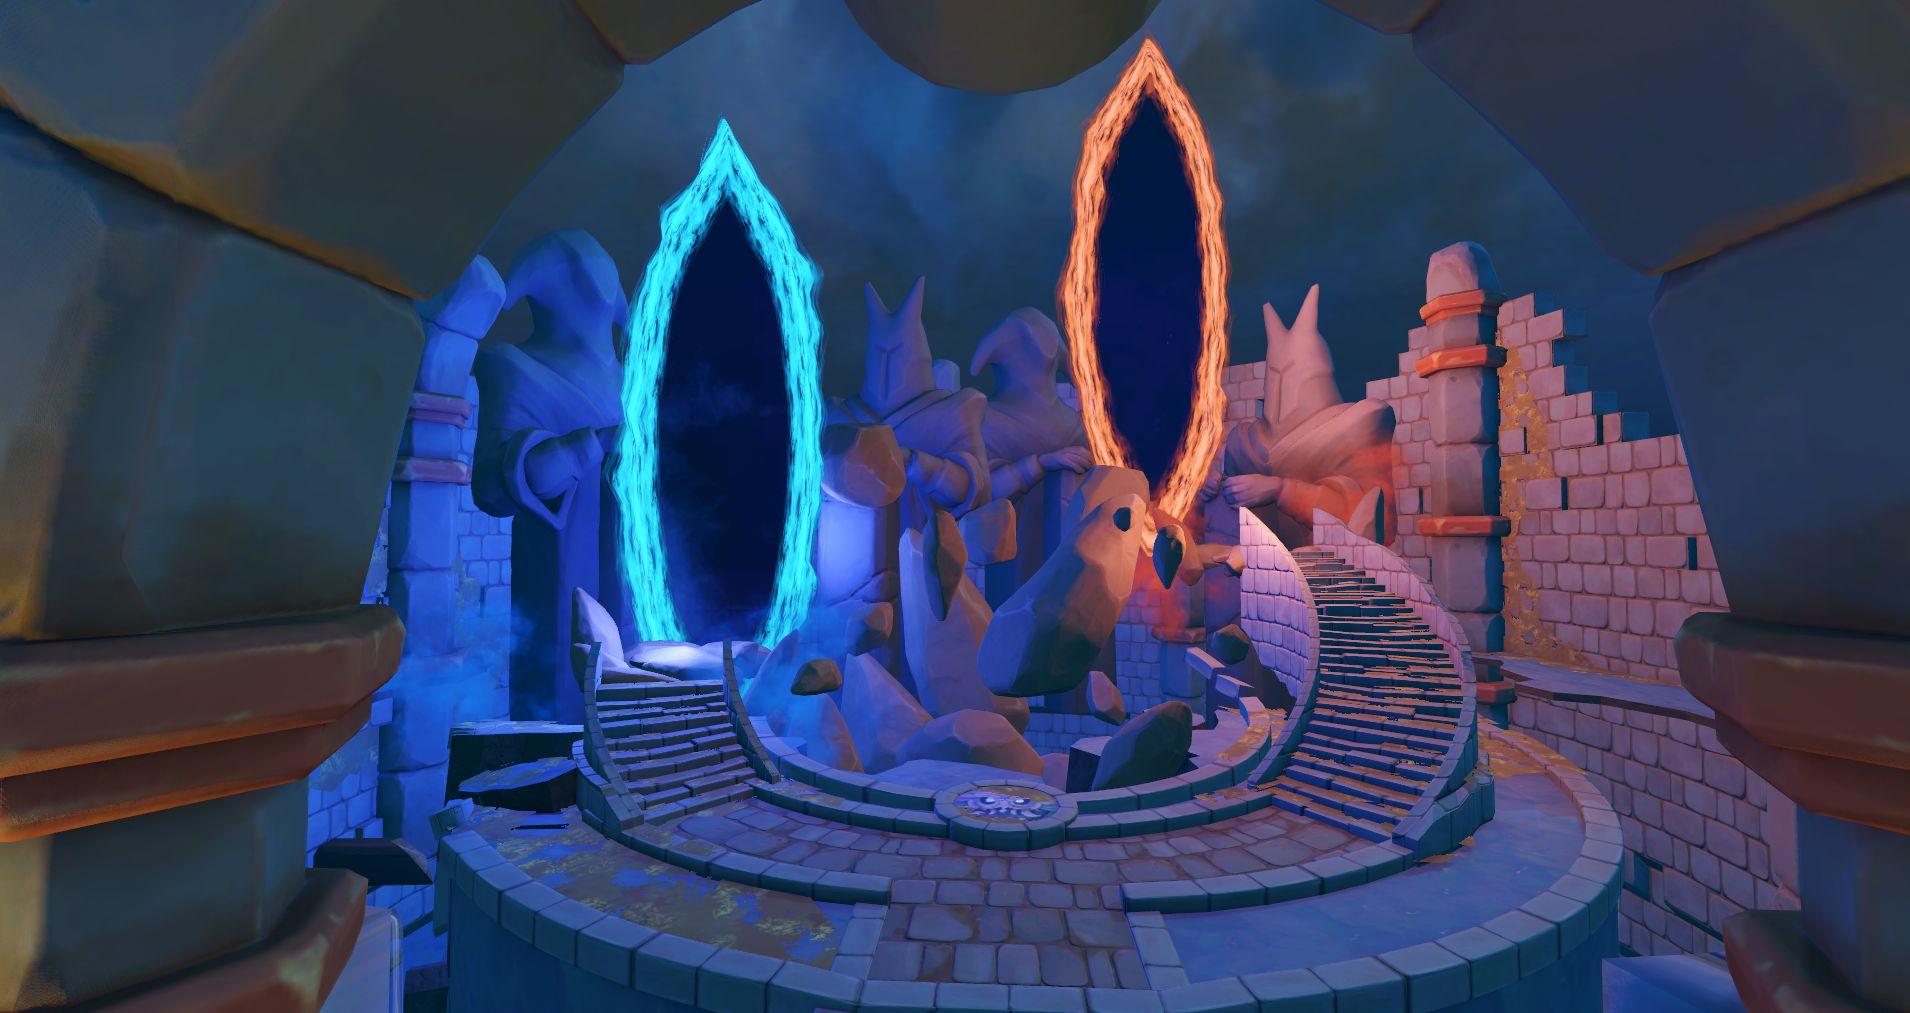 runescape_shattered_worlds_sworlds_portal_entrance